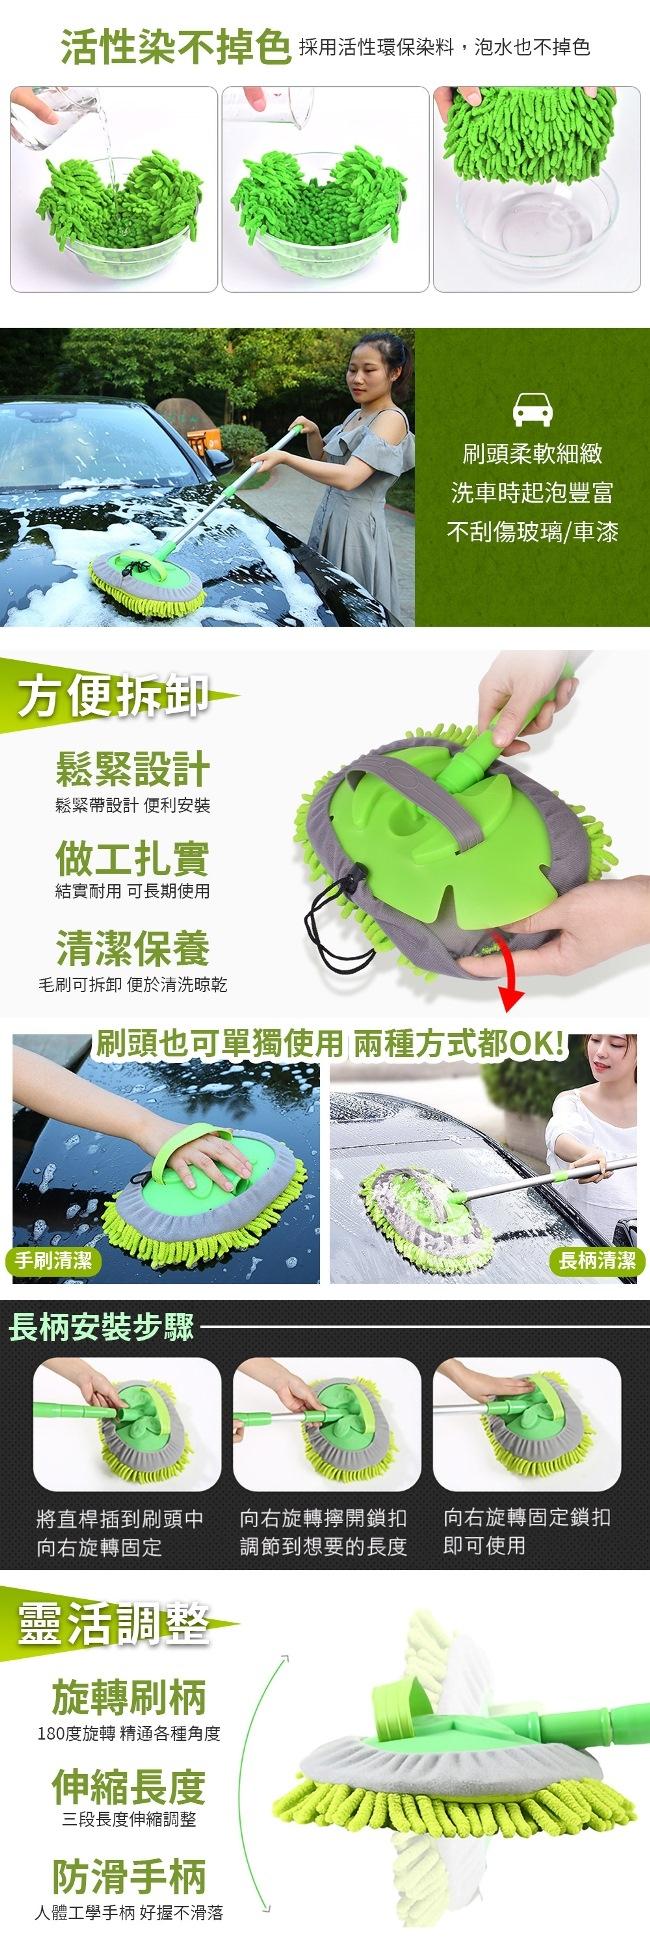 EZlife雪尼爾洗車伸縮拖把組(2組)加贈L2強光手電筒套組